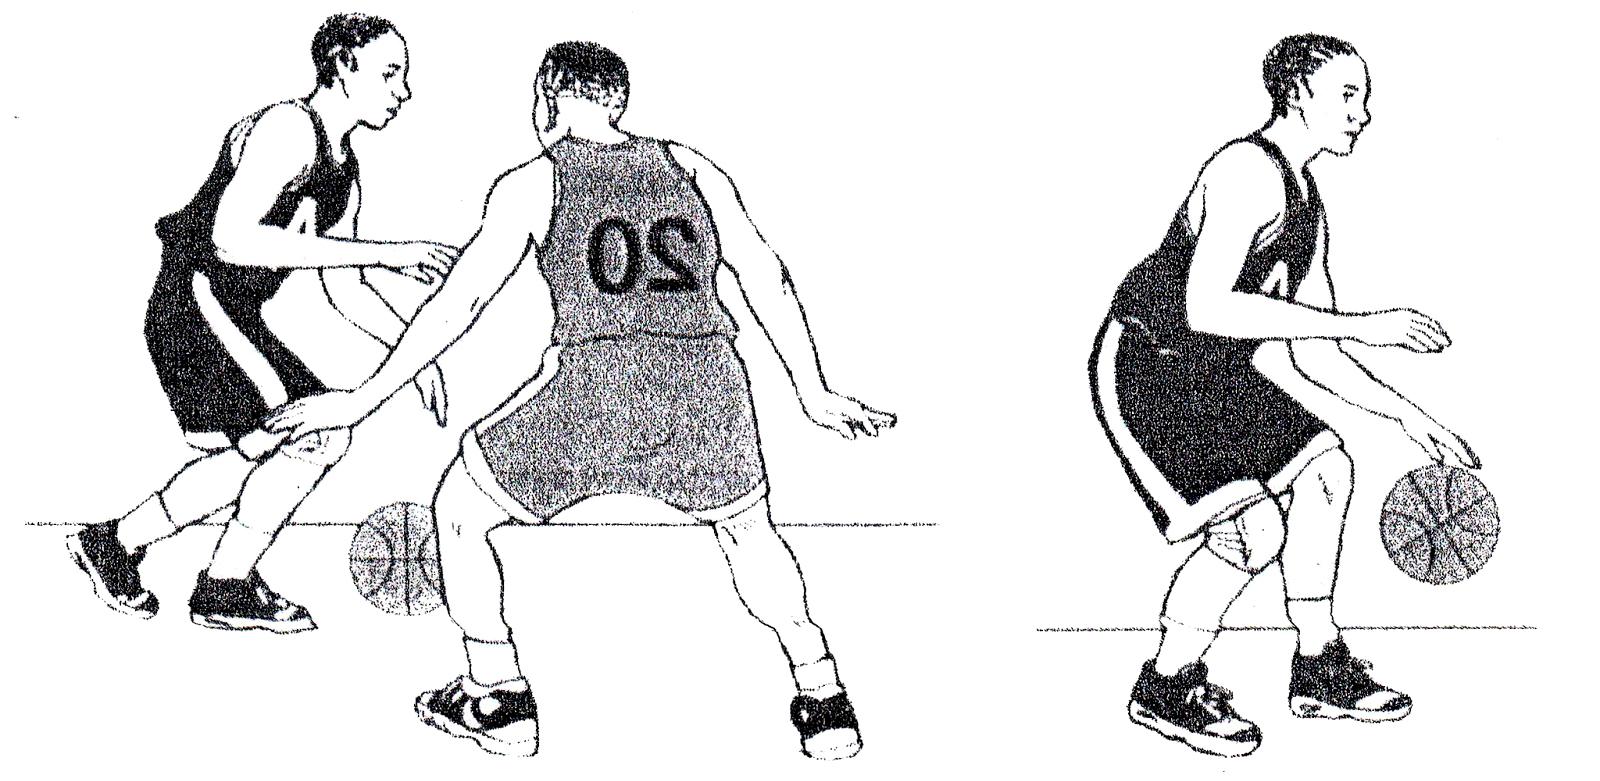 Pengertian Dribbling Dalam Bola Basket Beserta Cara Melakukannya Penjasorkes